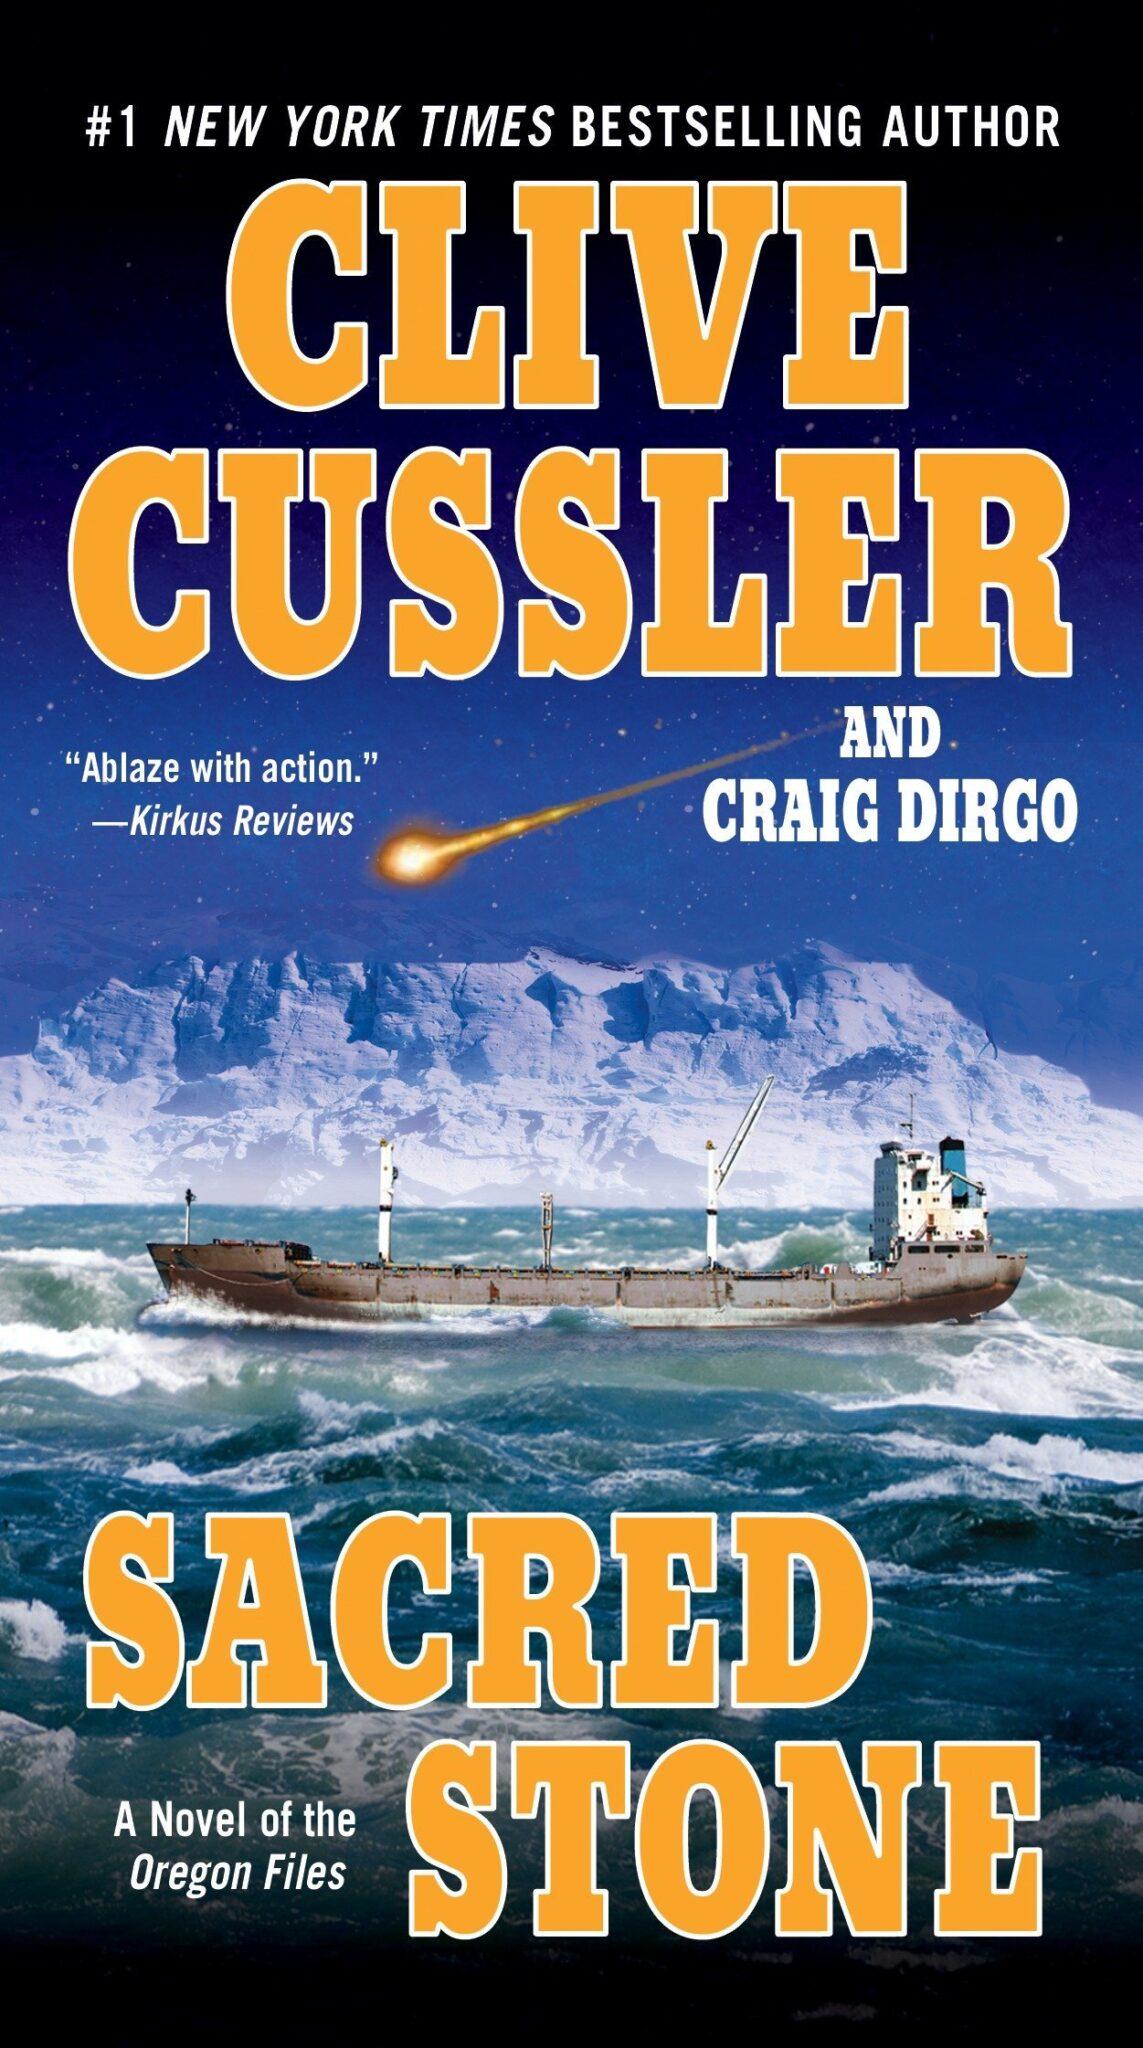 Clive Cussler books 27